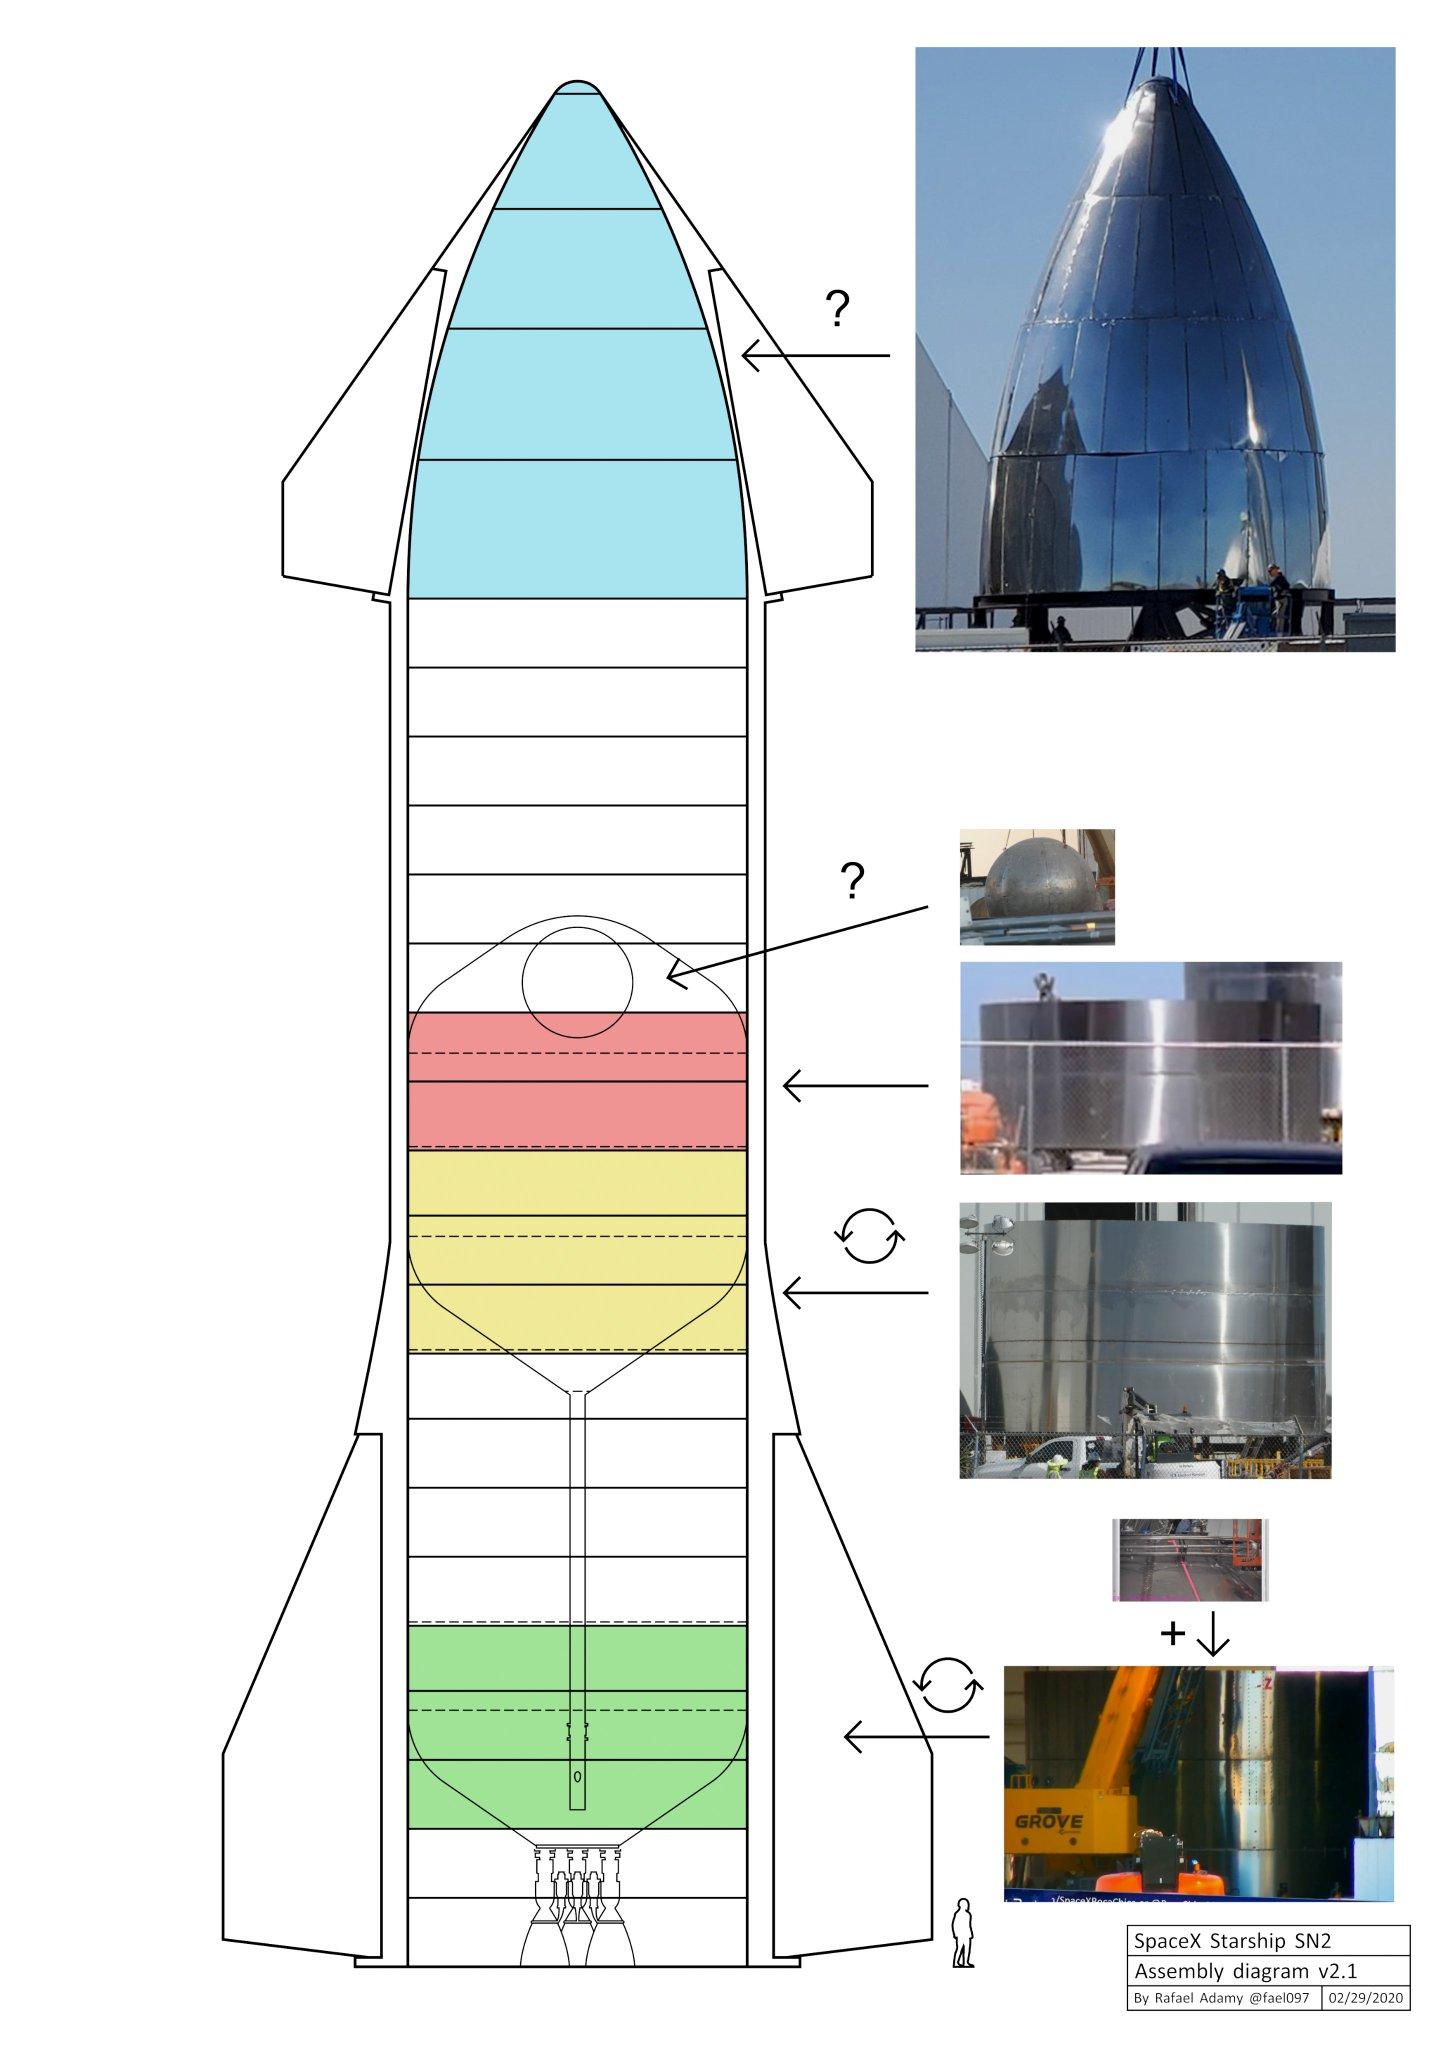 Starship SN2 (Boca Chica) ER-WOfBWAAEAiJQ?format=jpg&name=large